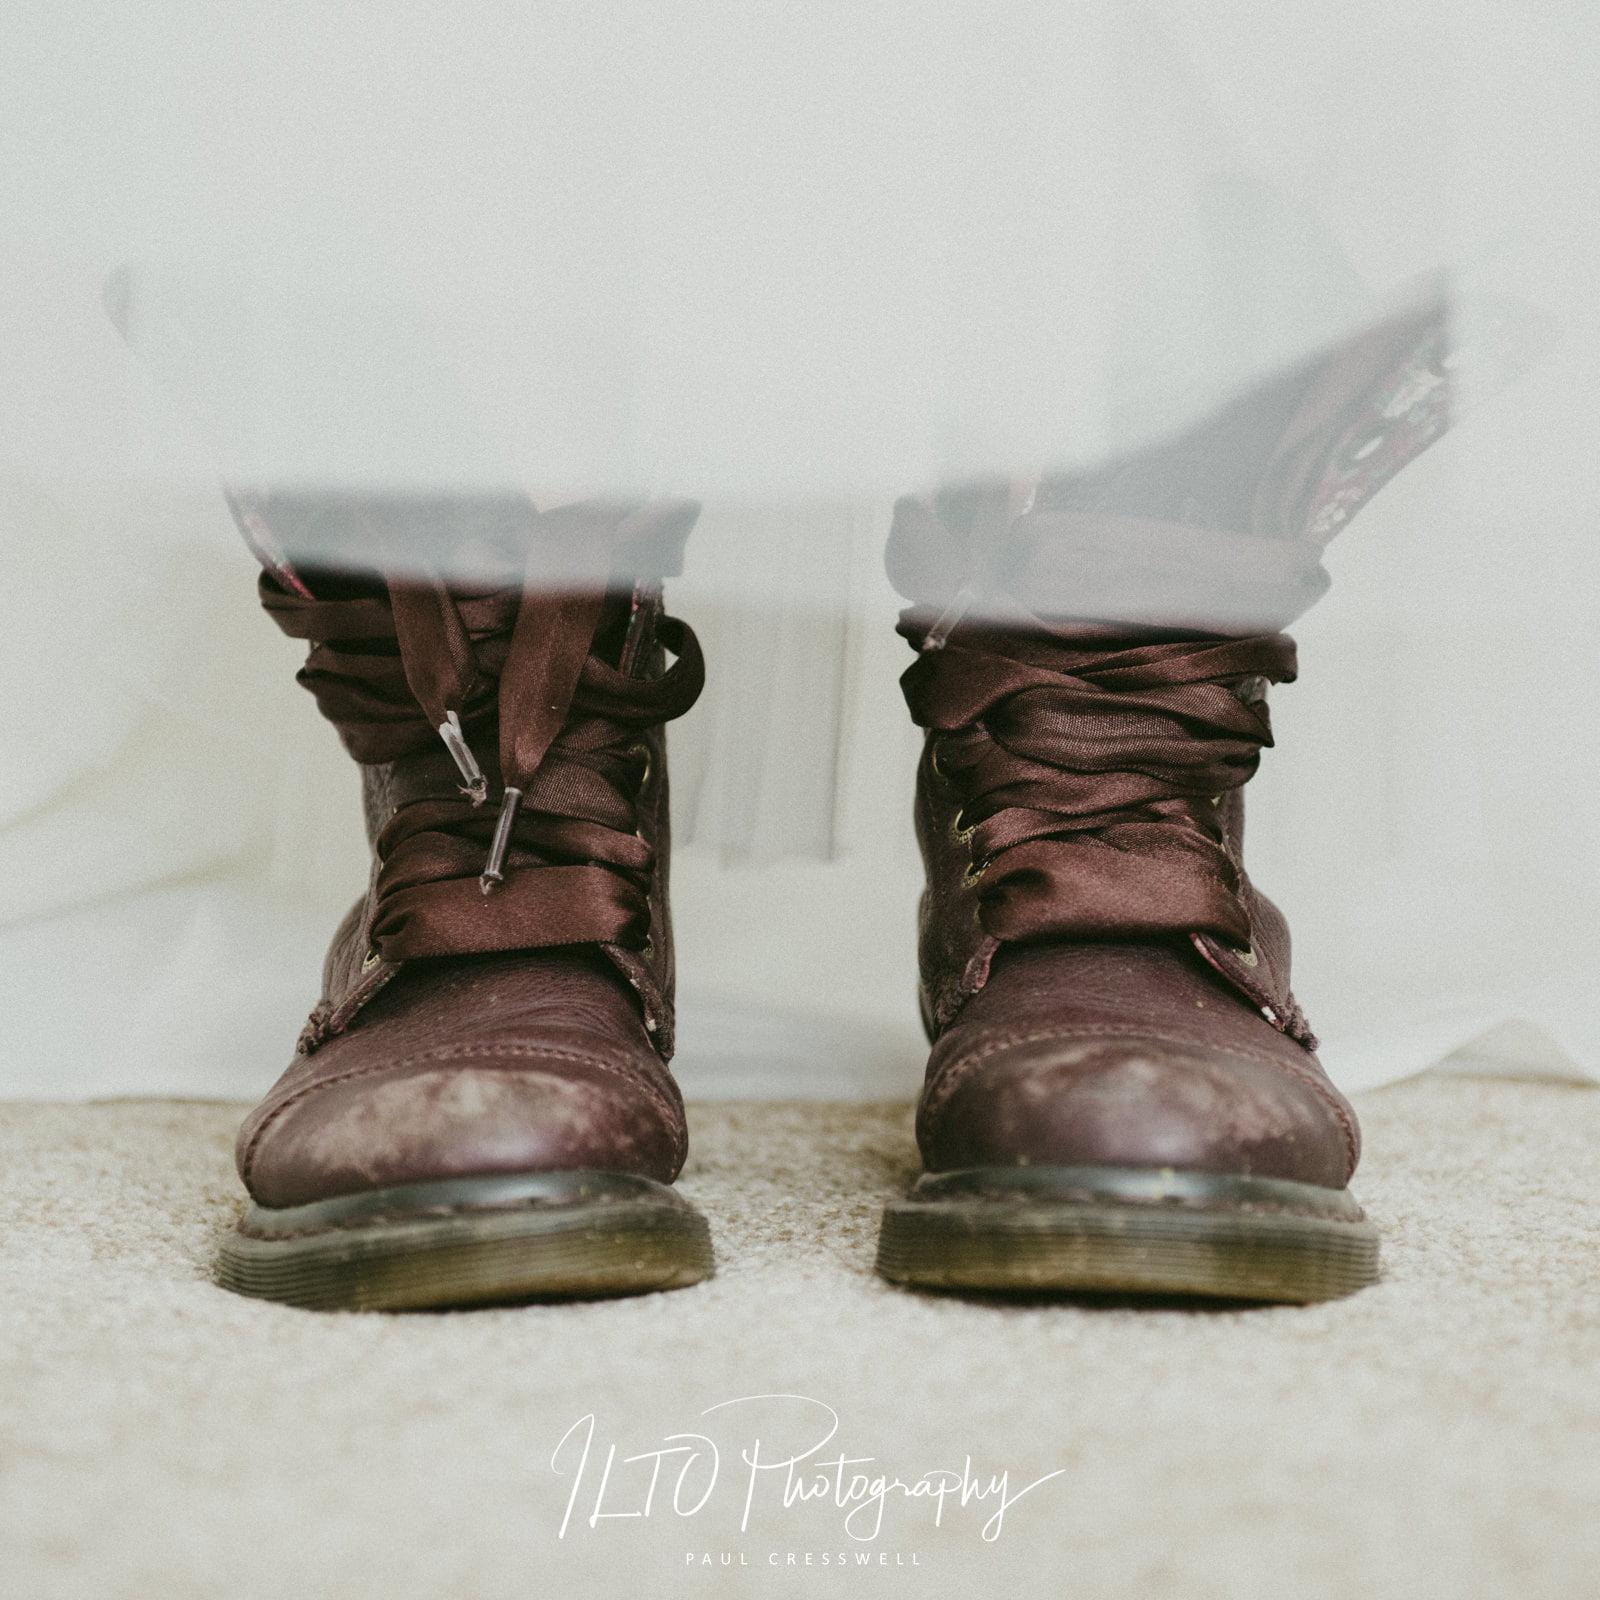 modern creative wedding photographer near me Yorkshire affordable